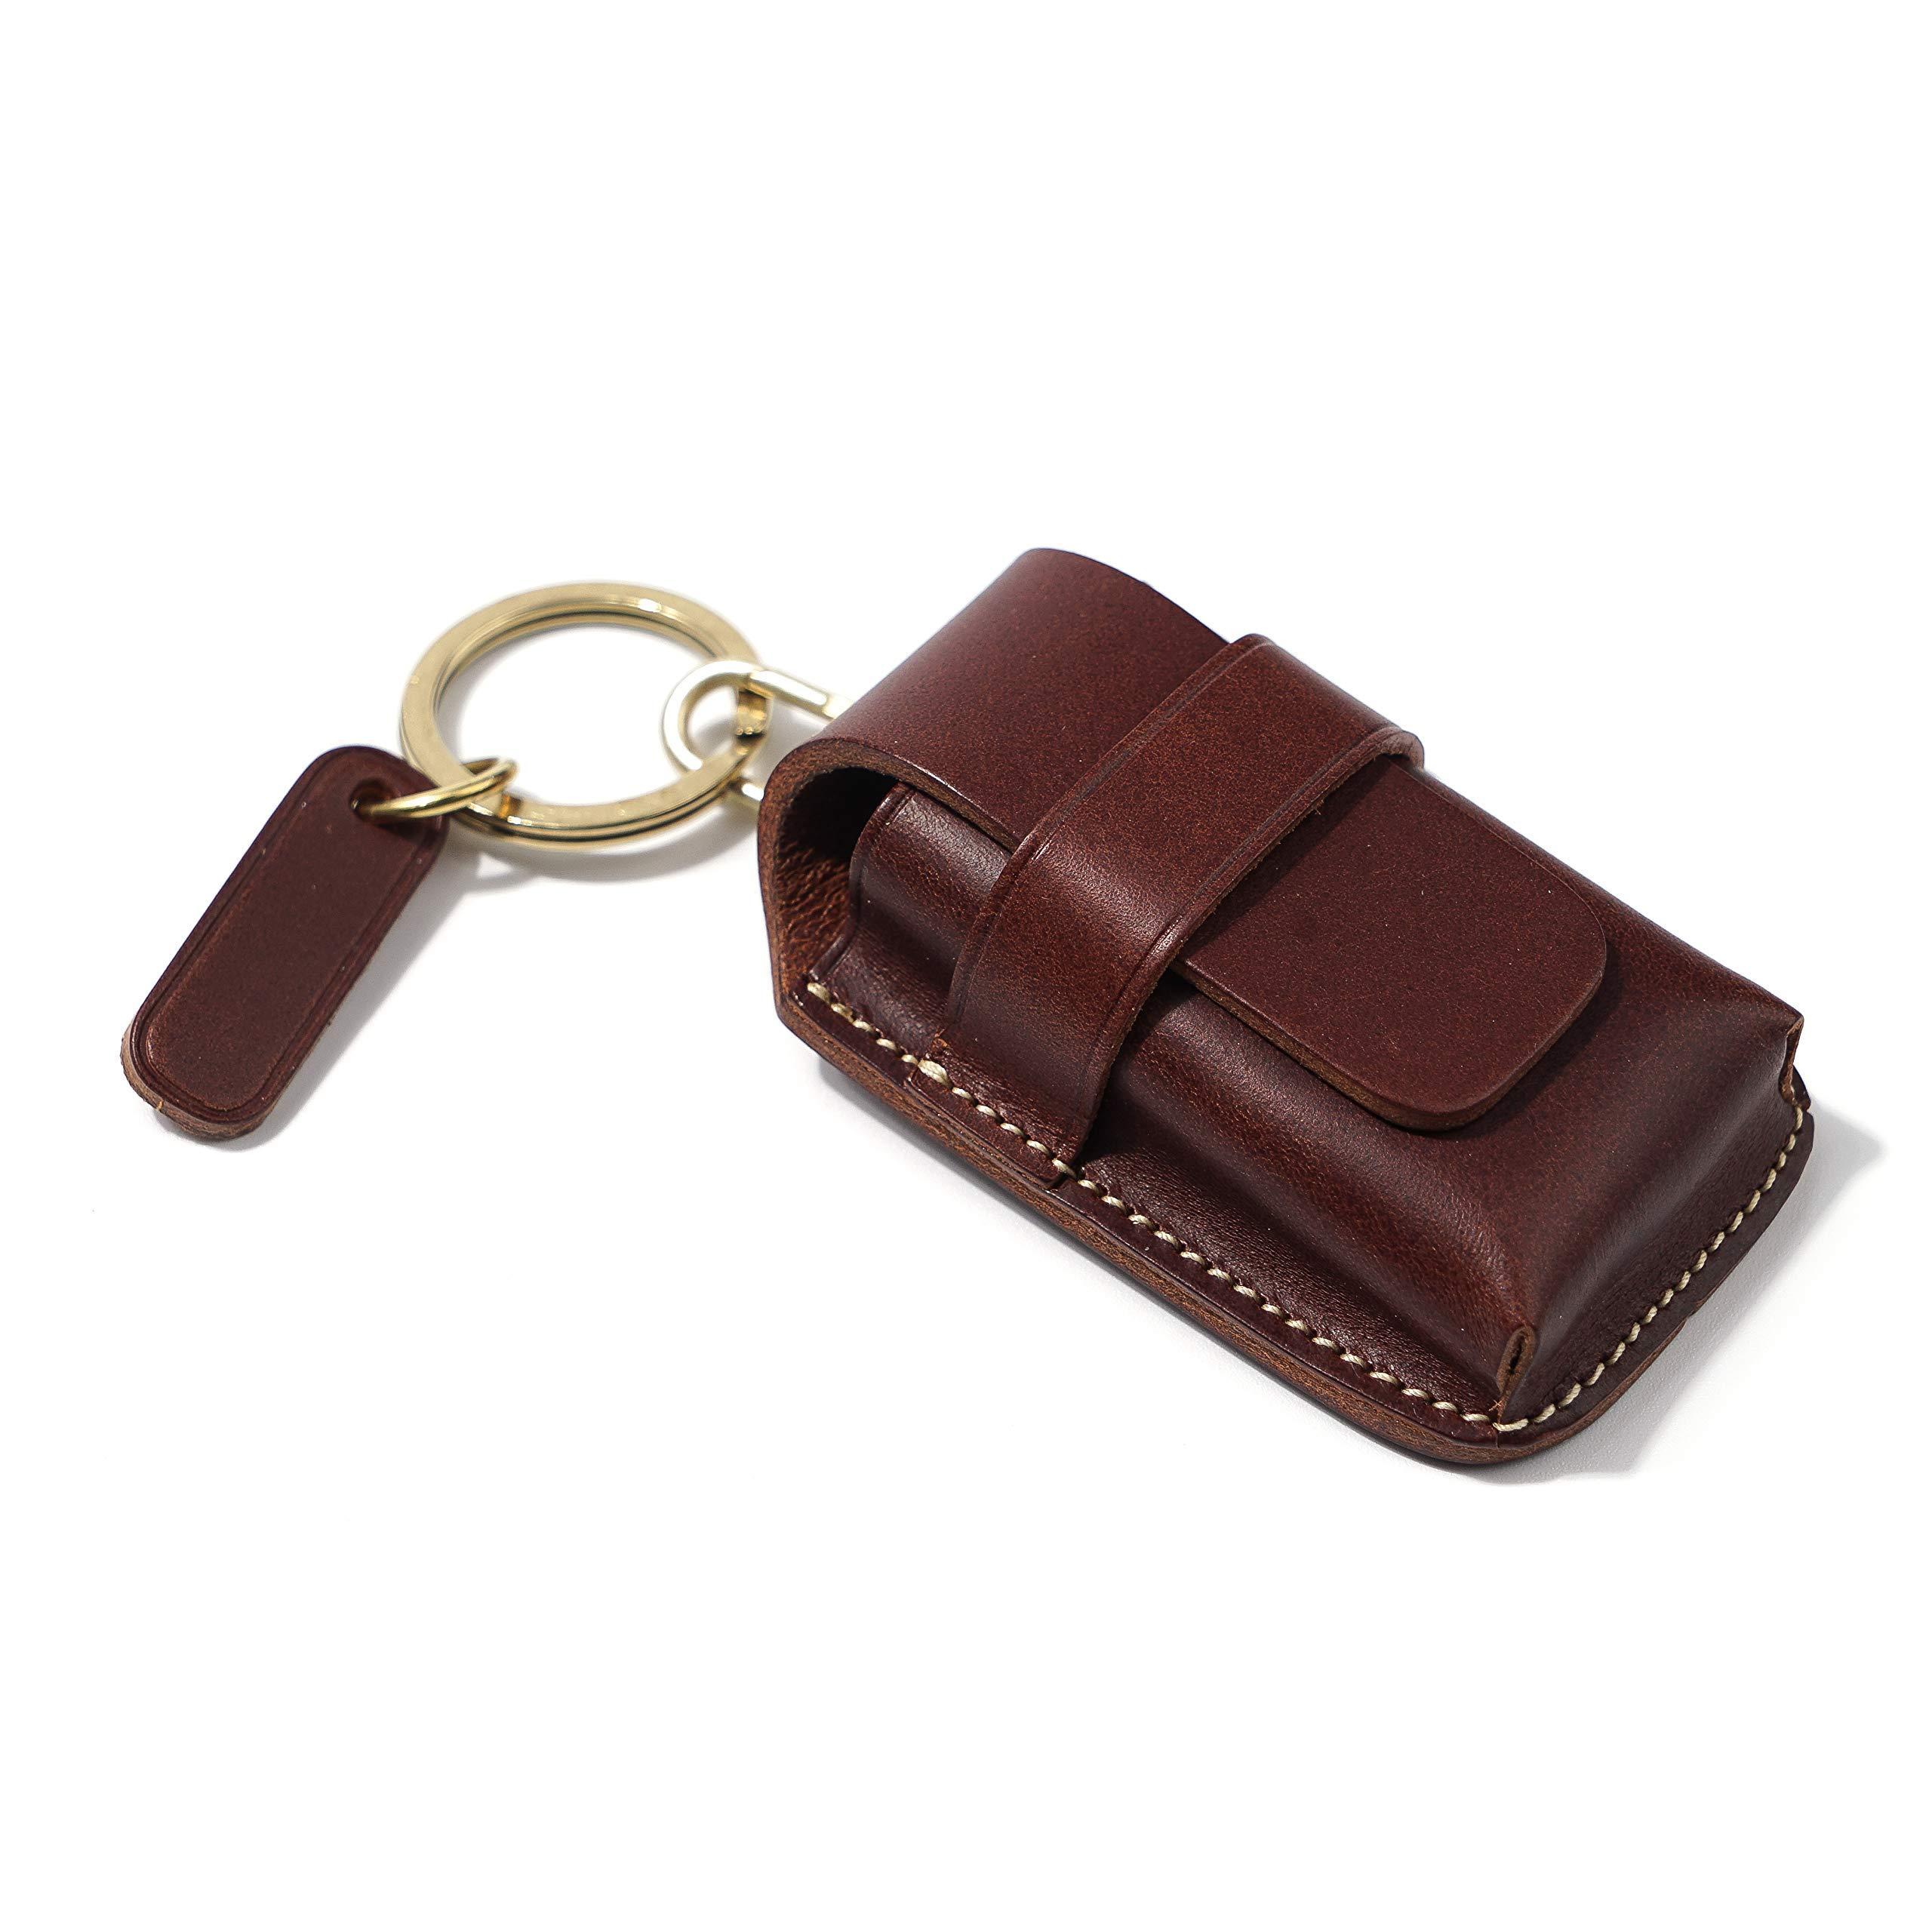 hevitz 7700 Universal Smart Key Pouch Wood Brown